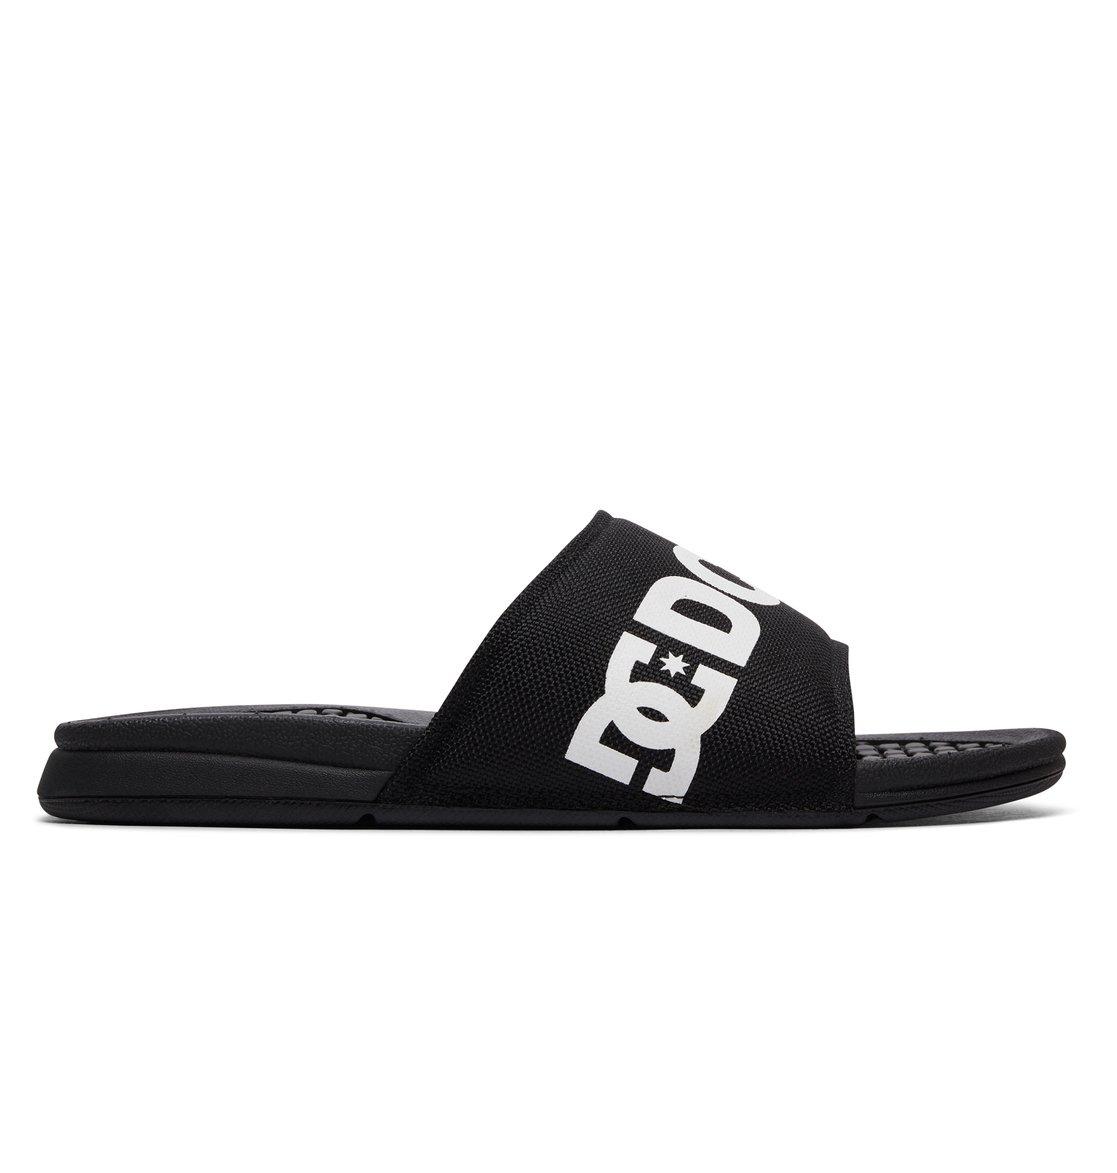 Dc Shoes Curseurs Bolsa En Noir - Noir / Blanc MsbmmJi